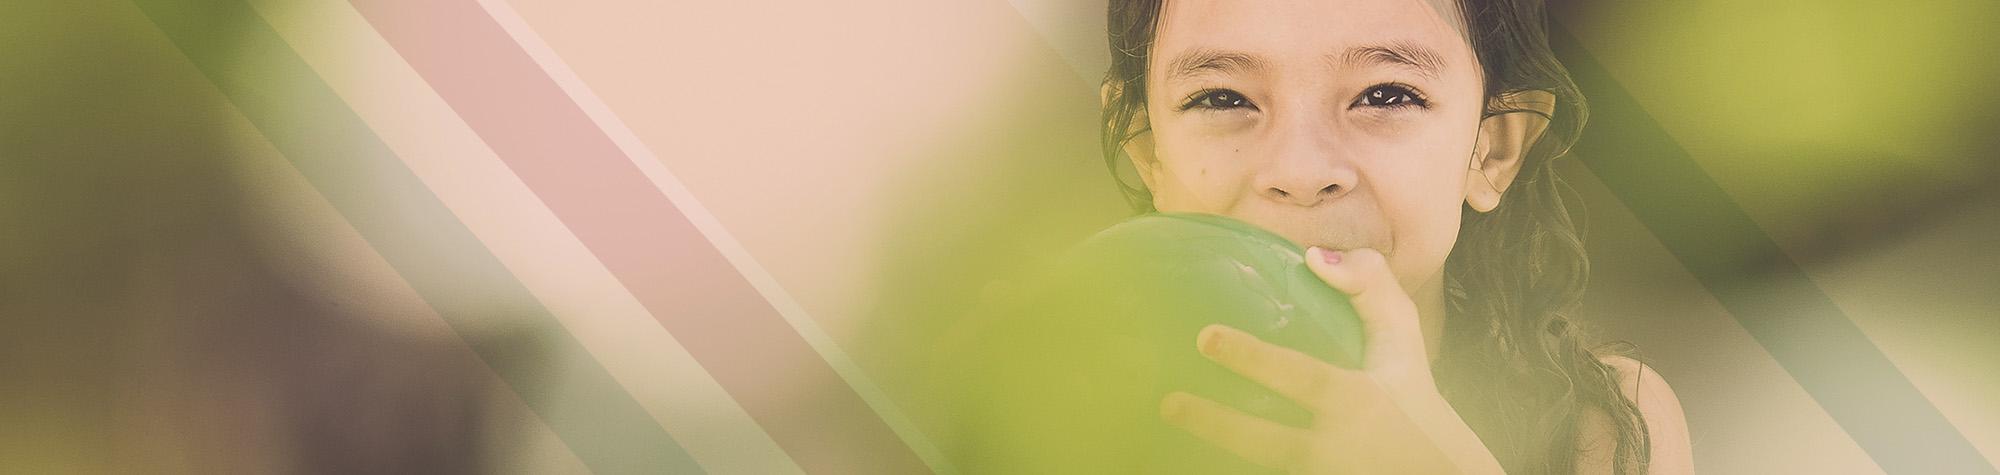 Kind mit gruenem Ball in den Haenden